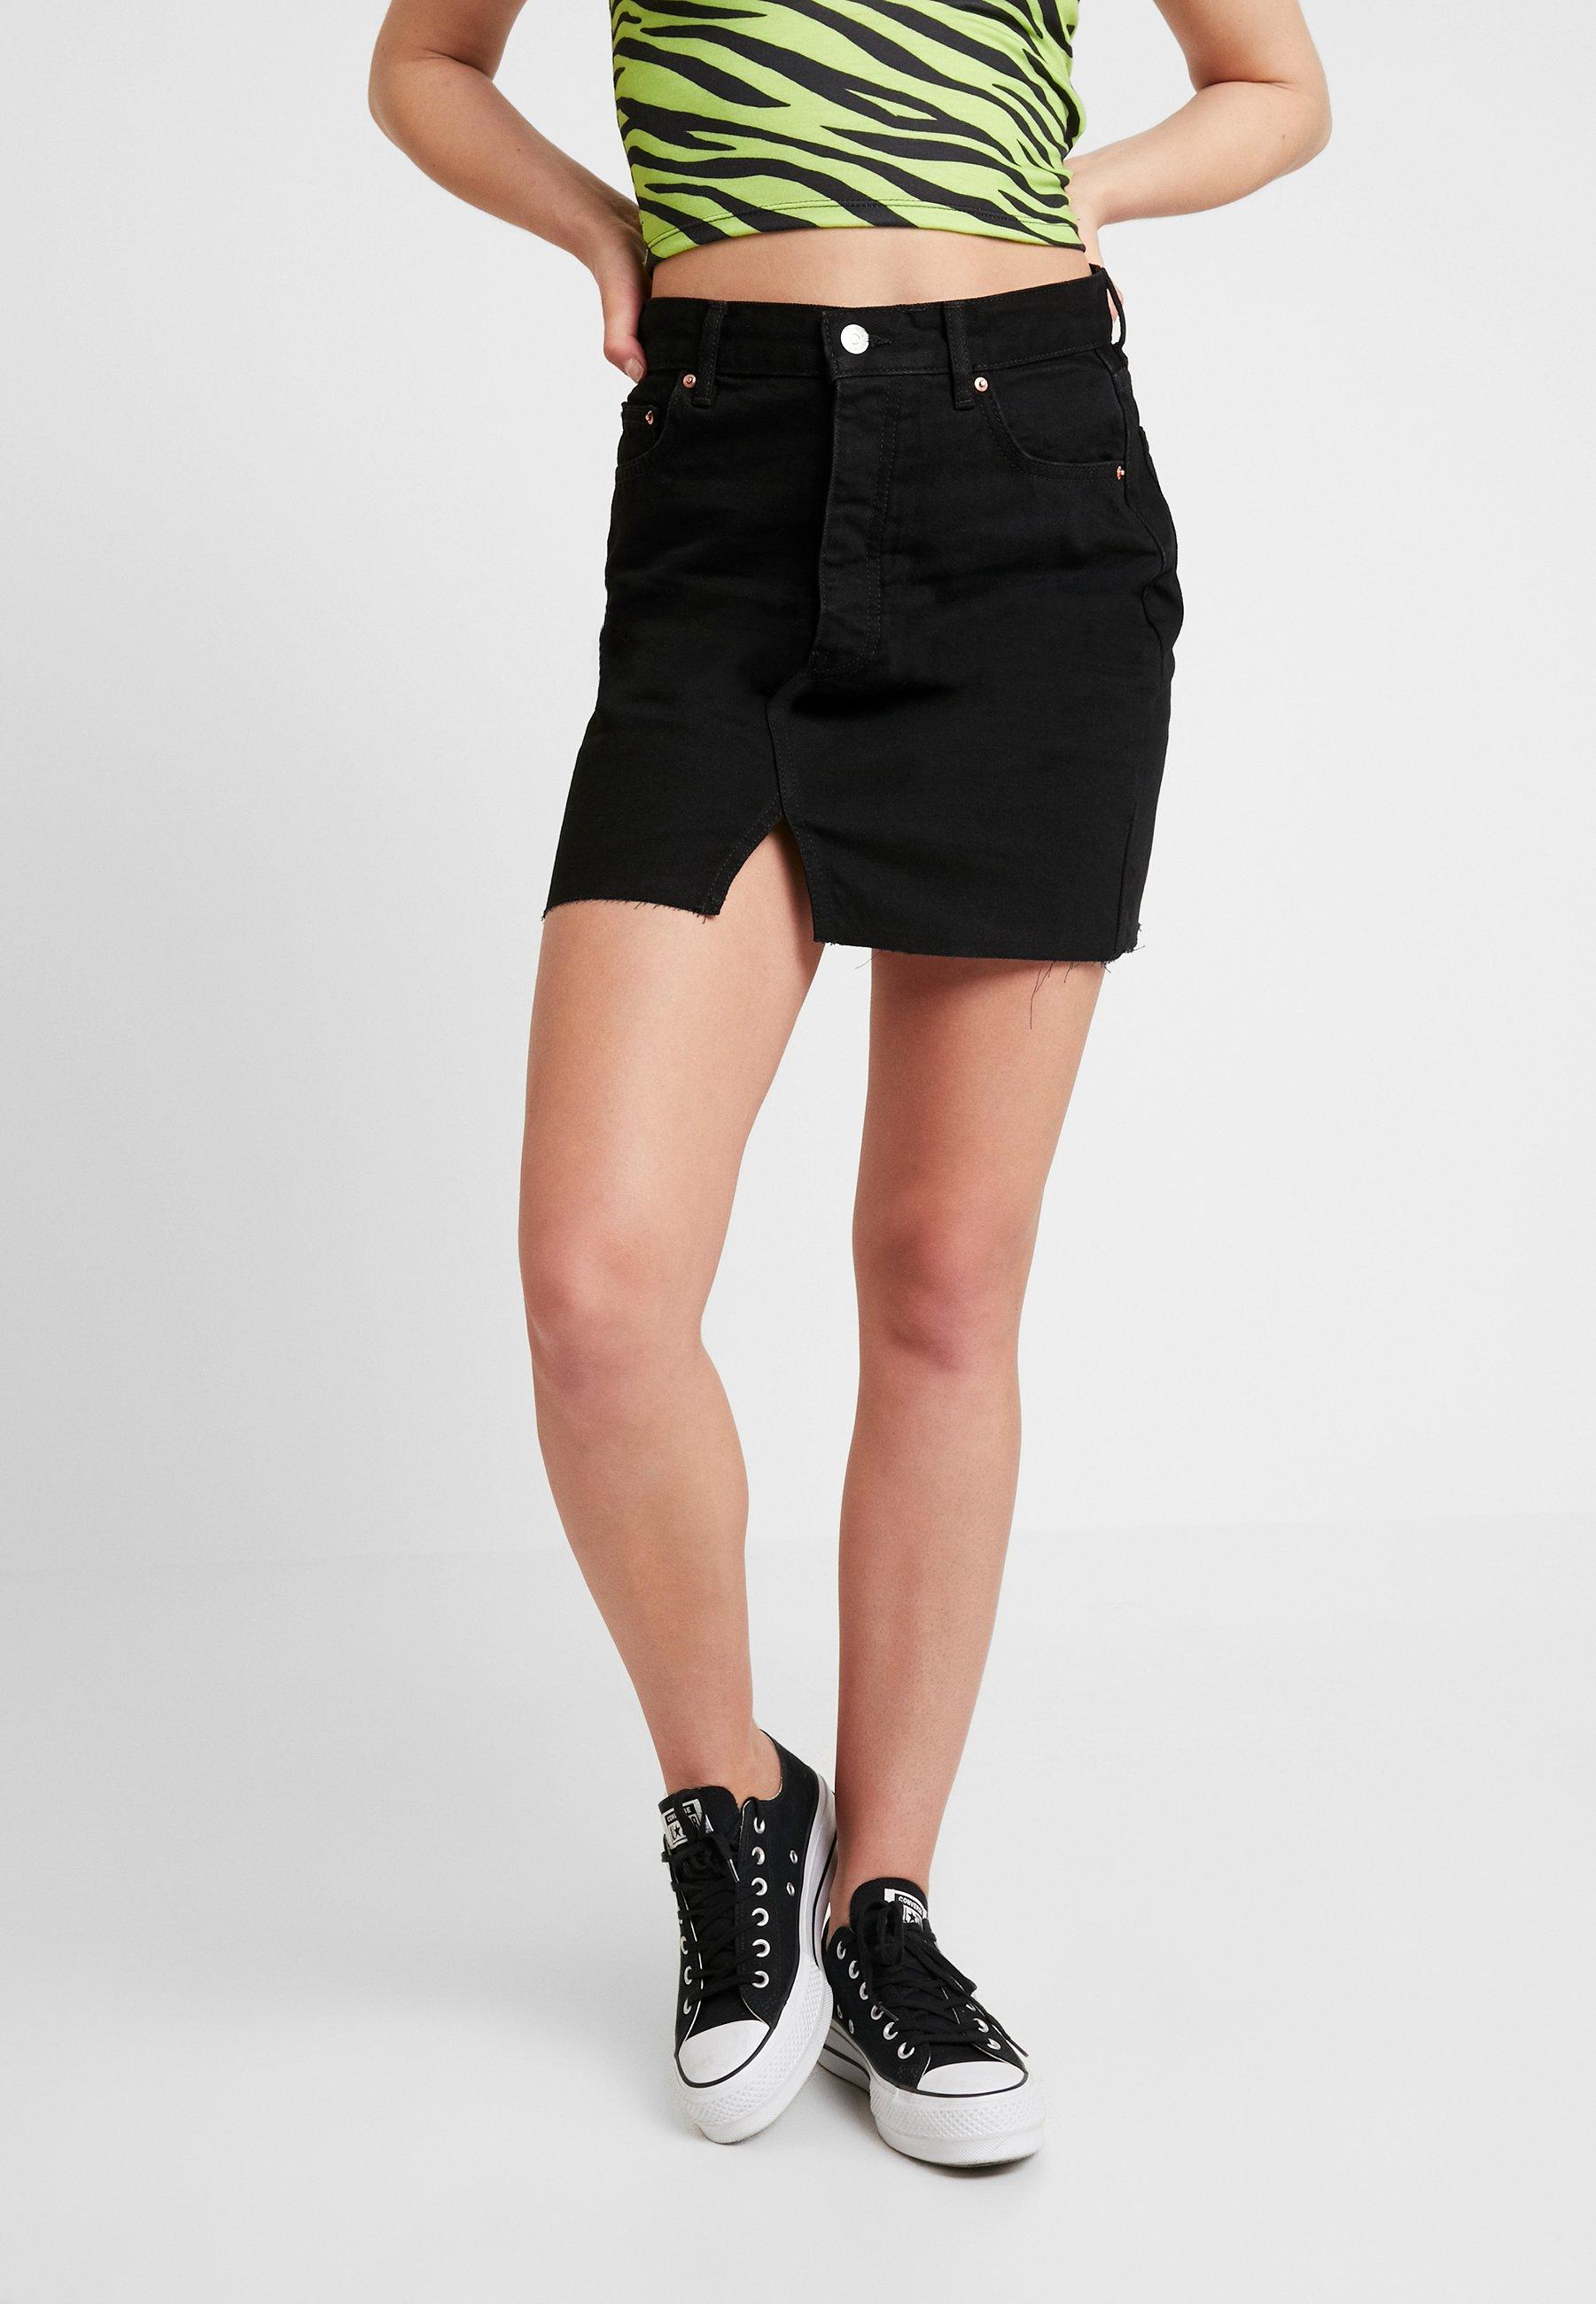 Black Gina En Tricot Original SkirtJupe Jean MVzqUpS